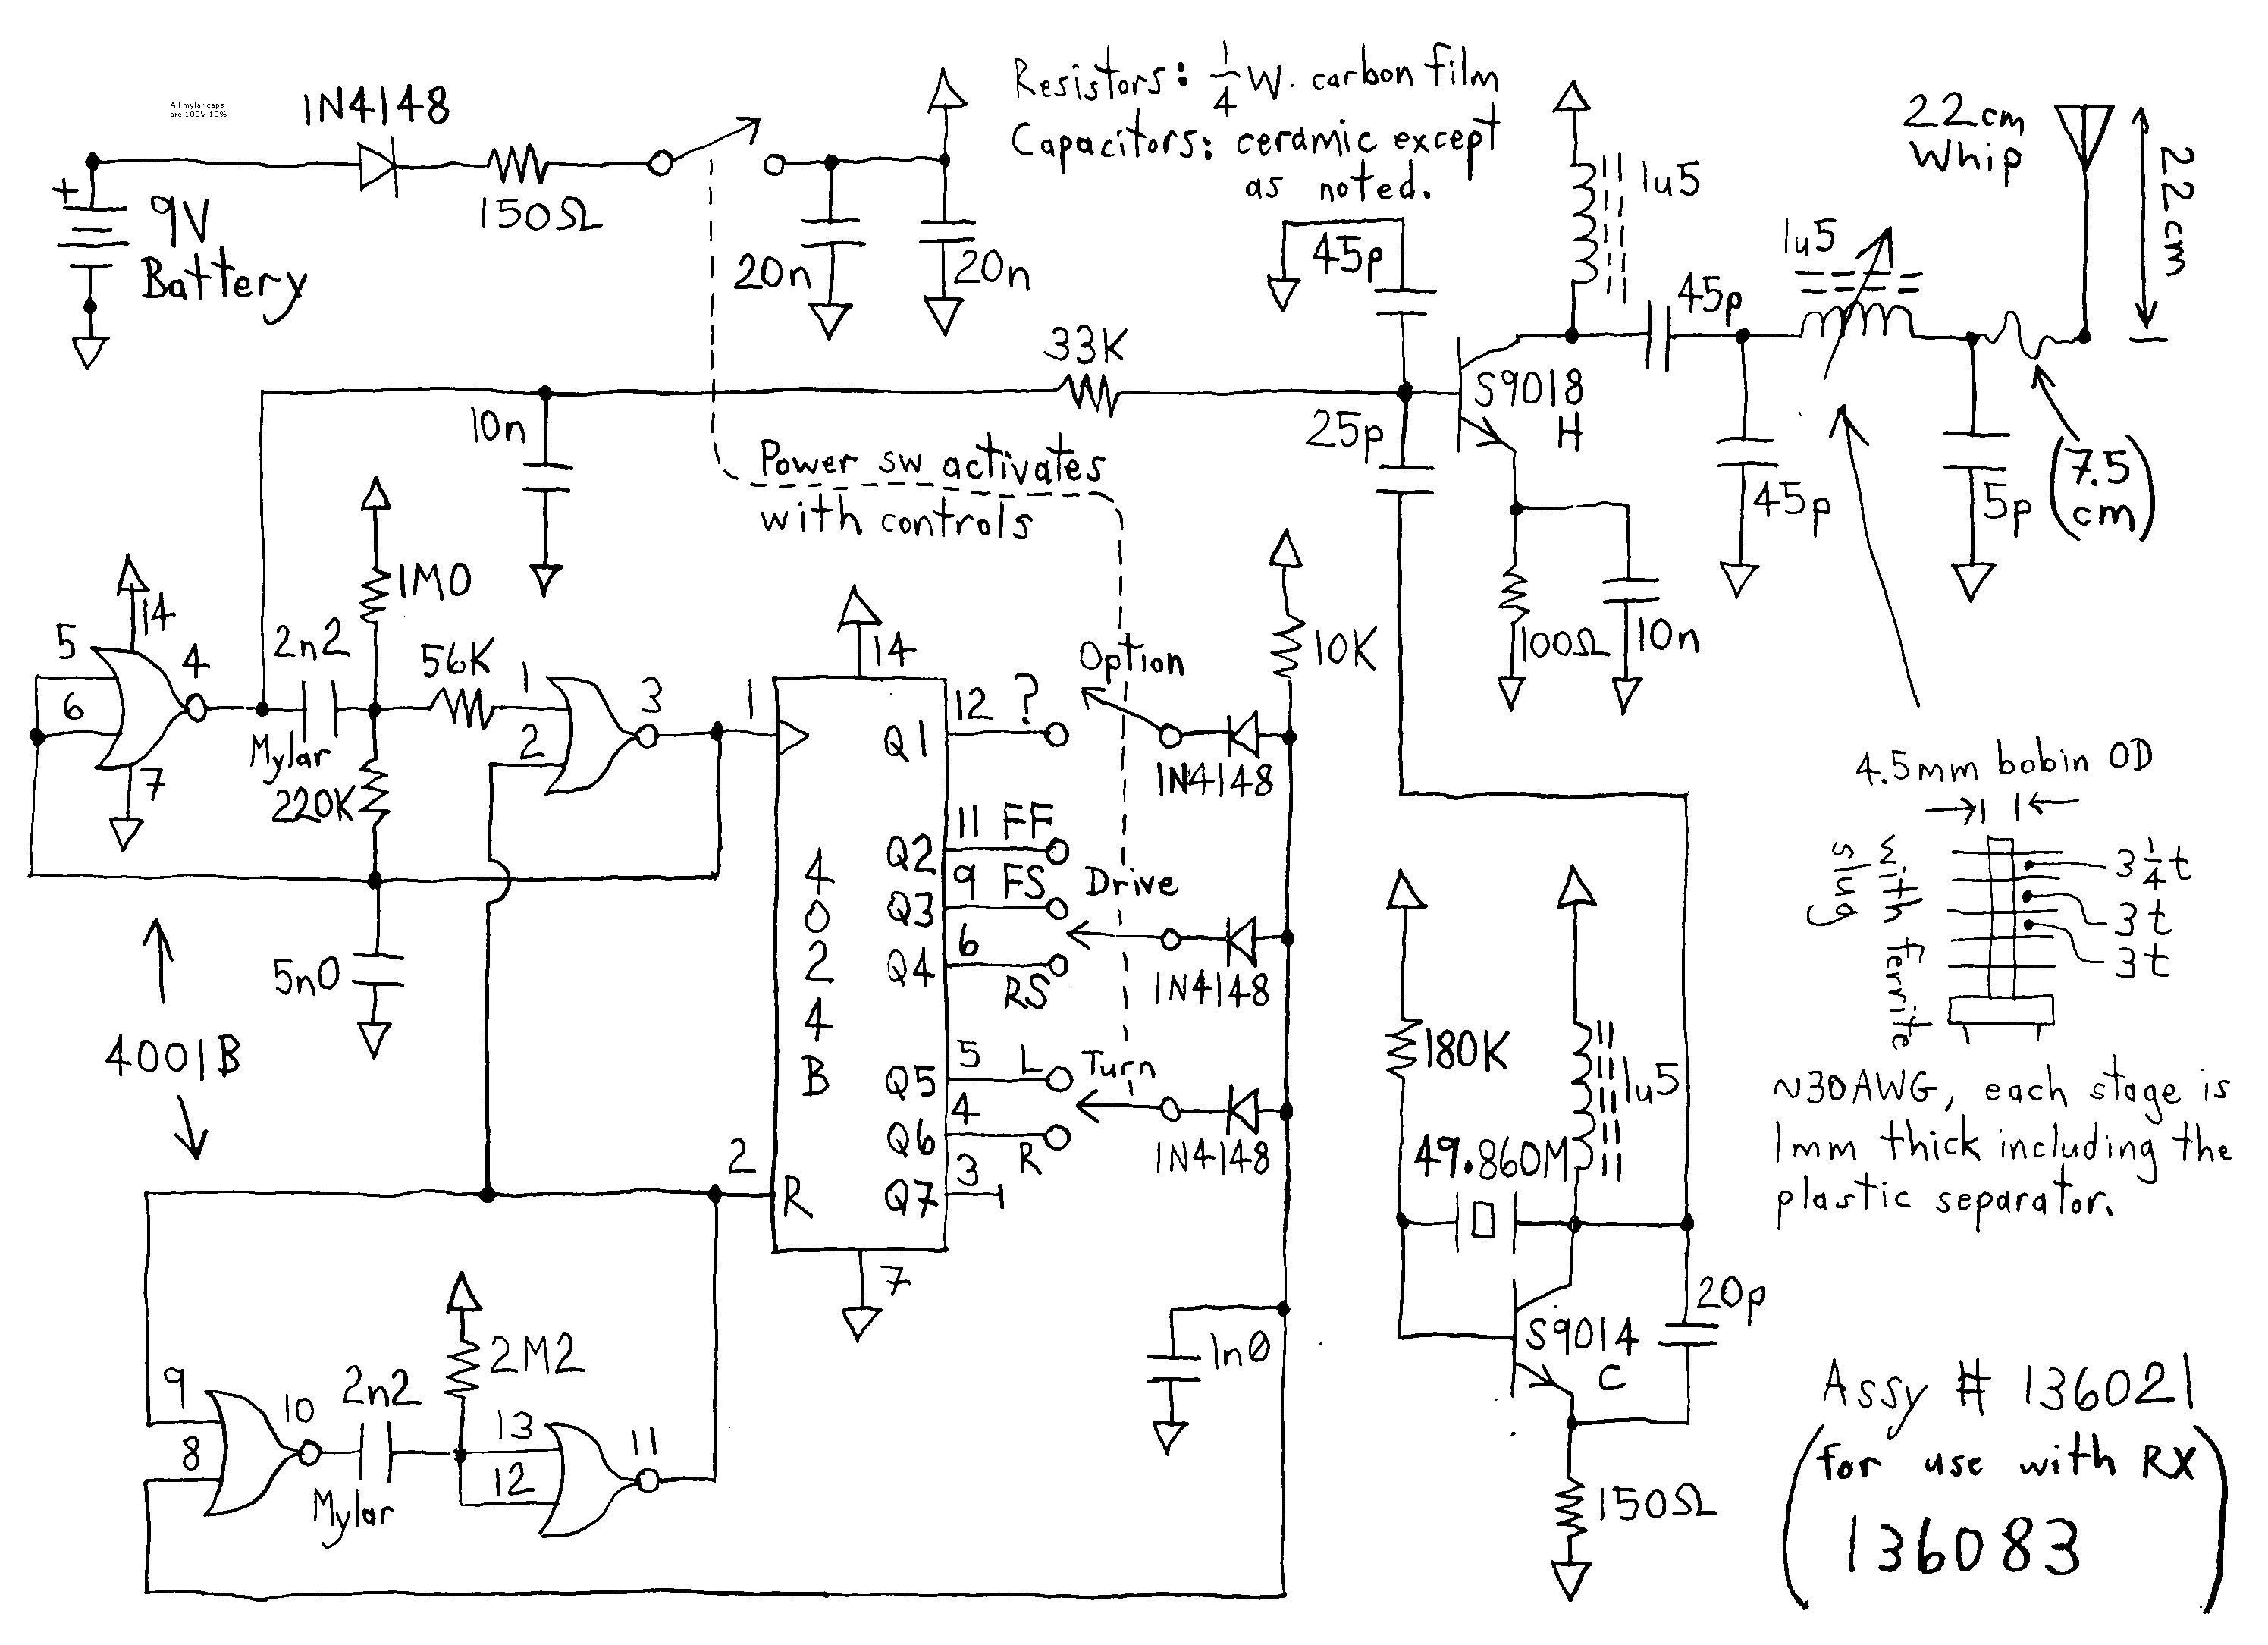 Labeled Car Dashboard Diagram Multiple Amplifier Wiring Diagram Best Amp Wiring Diagram Car Of Labeled Car Dashboard Diagram